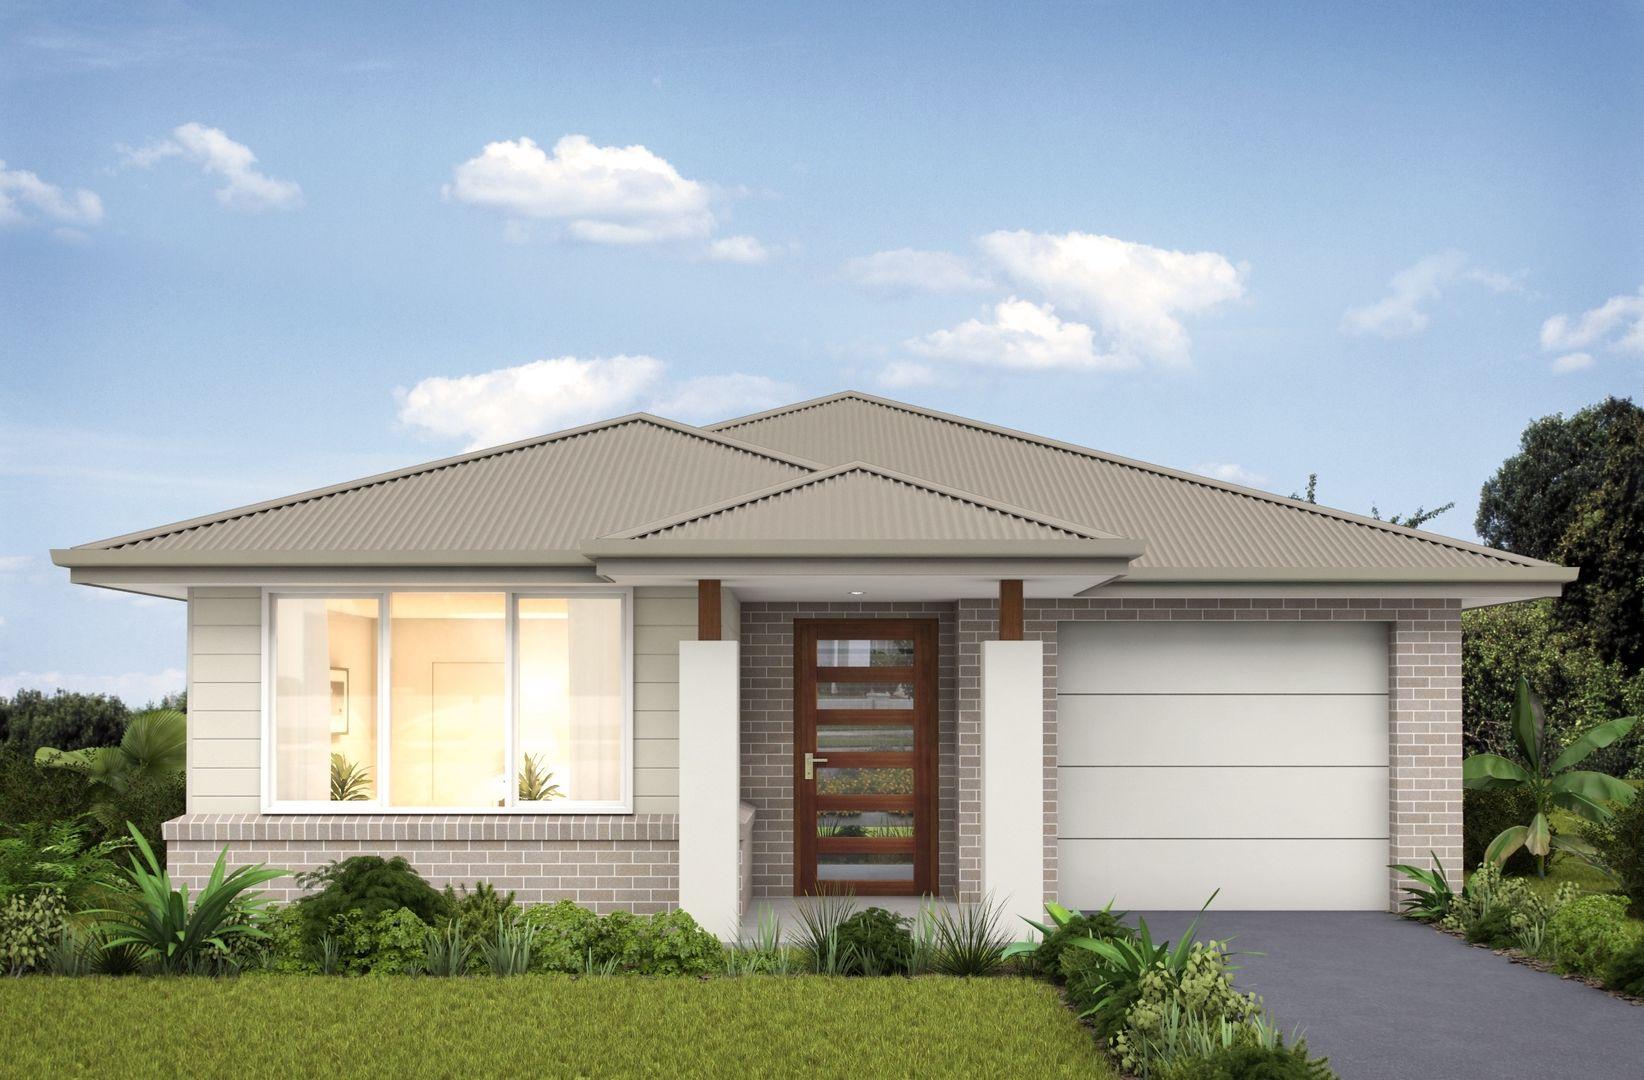 Lot 133 William Street, Riverstone NSW 2765, Image 0